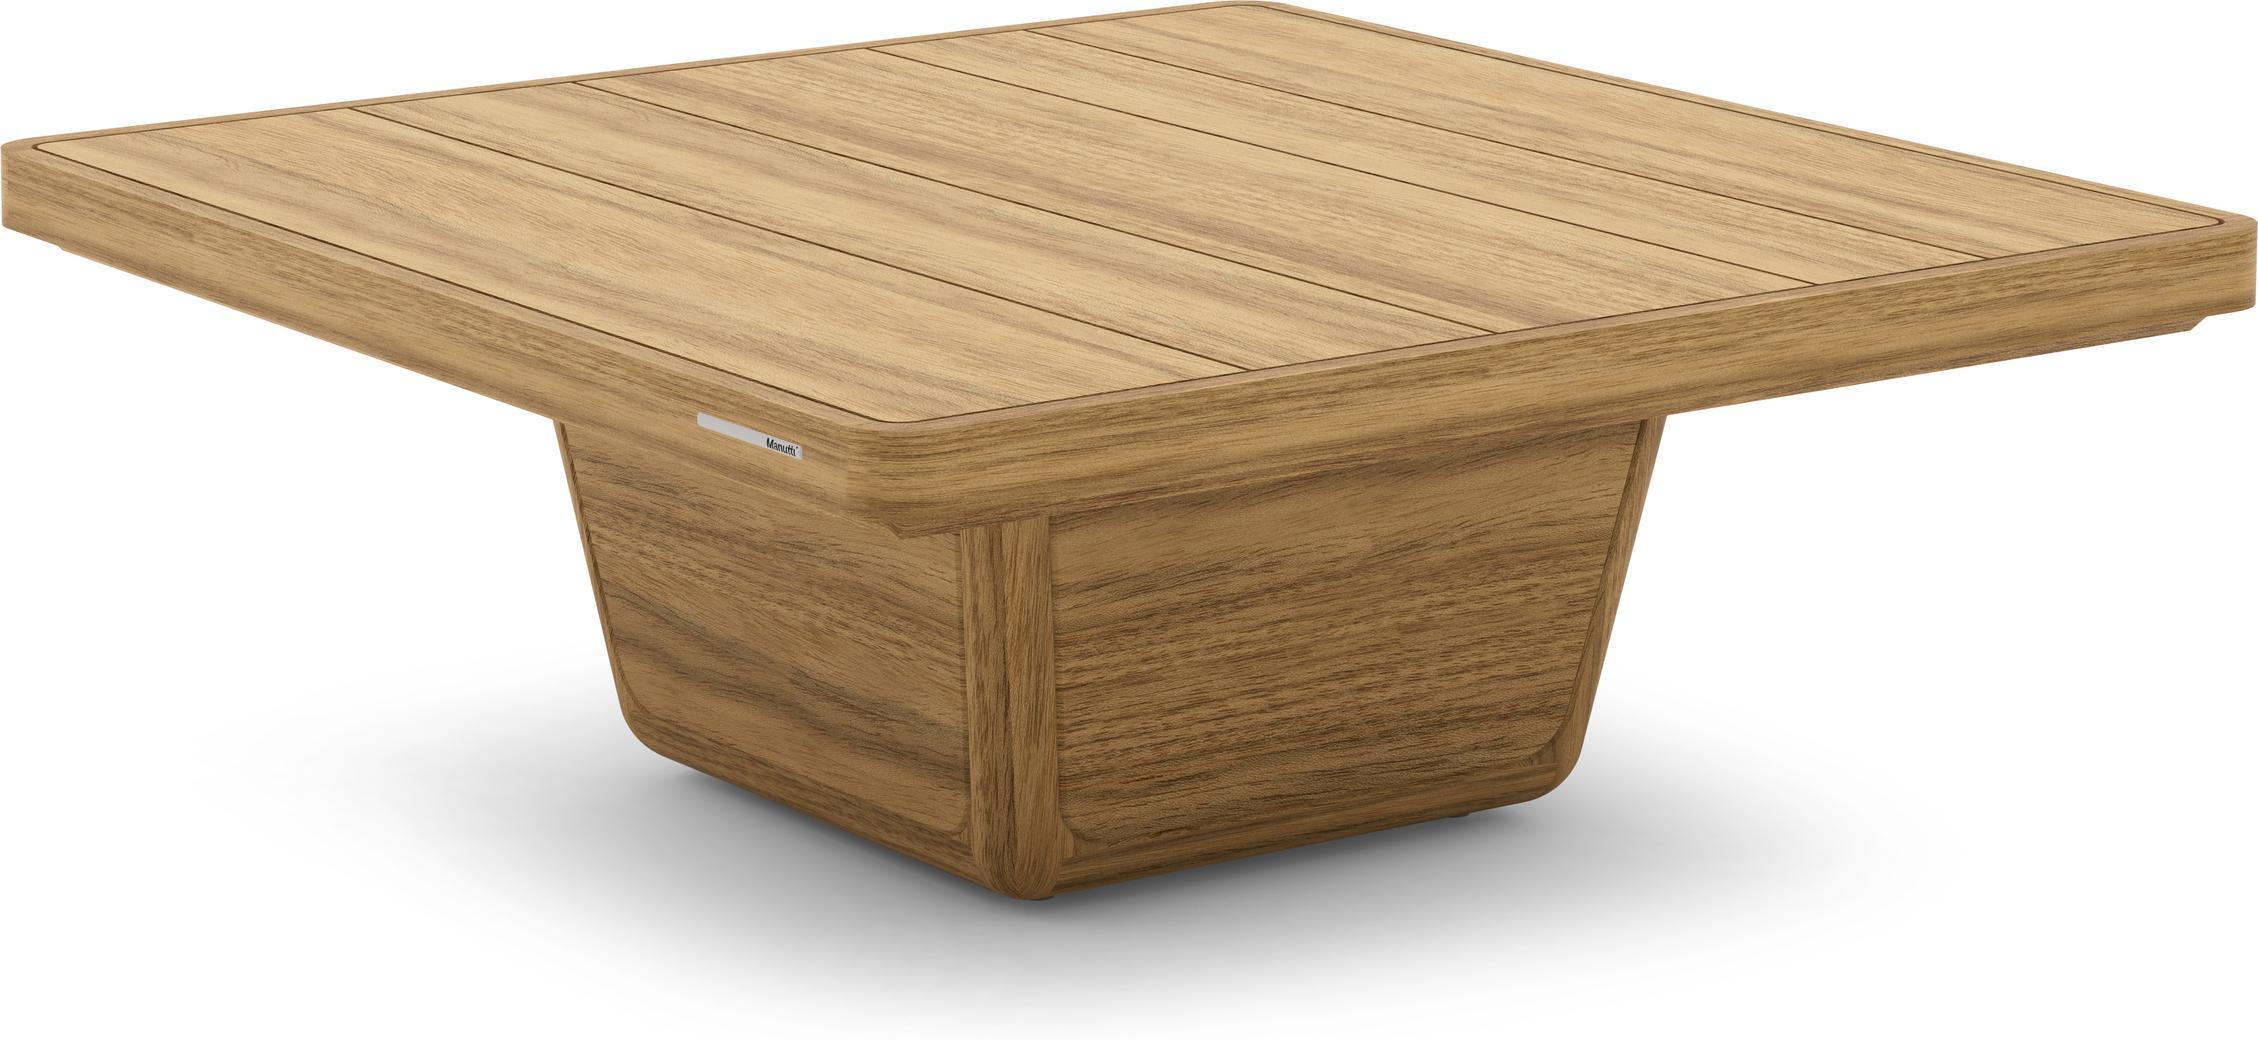 Cobi coffee table 79x79x30 brushed teak